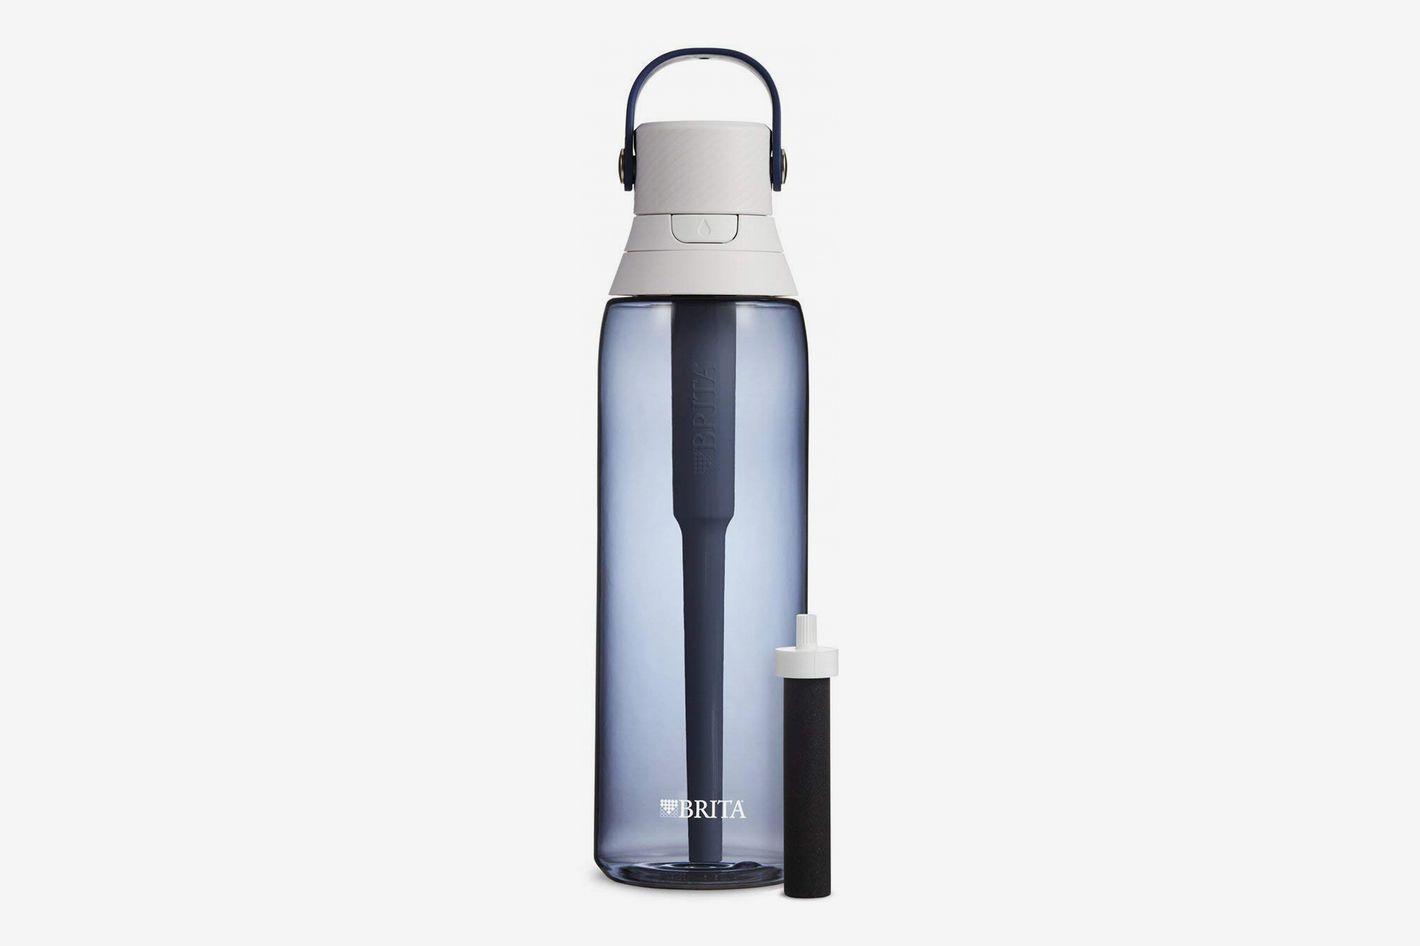 Brita 26-Ounce Premium Filtering Water Bottle